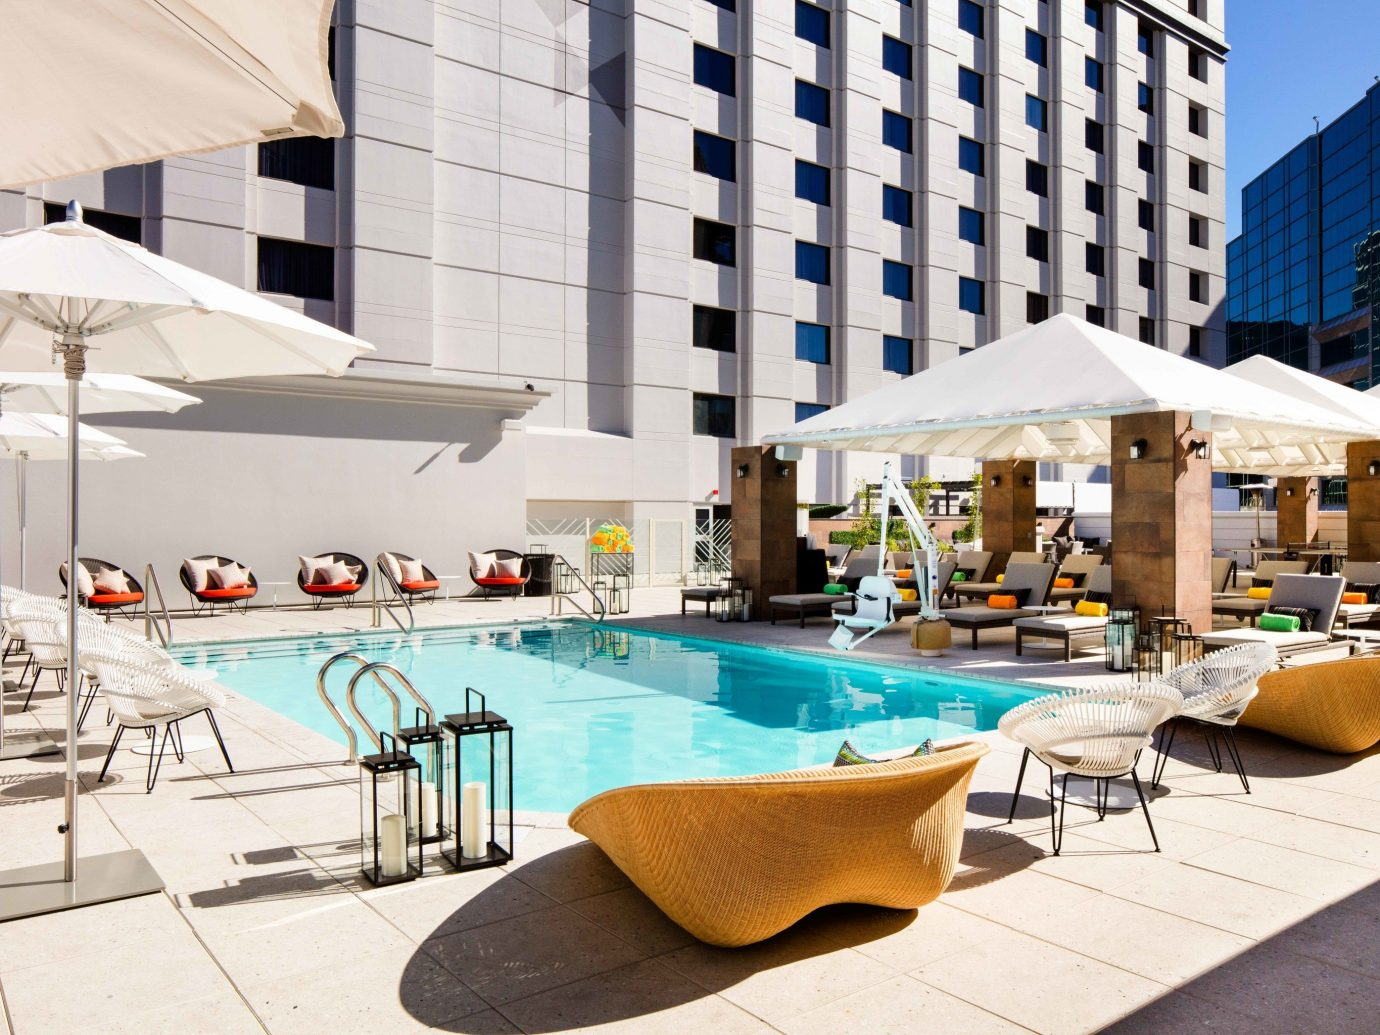 swimming pool leisure hotel apartment Resort real estate condominium vacation table leisure centre estate